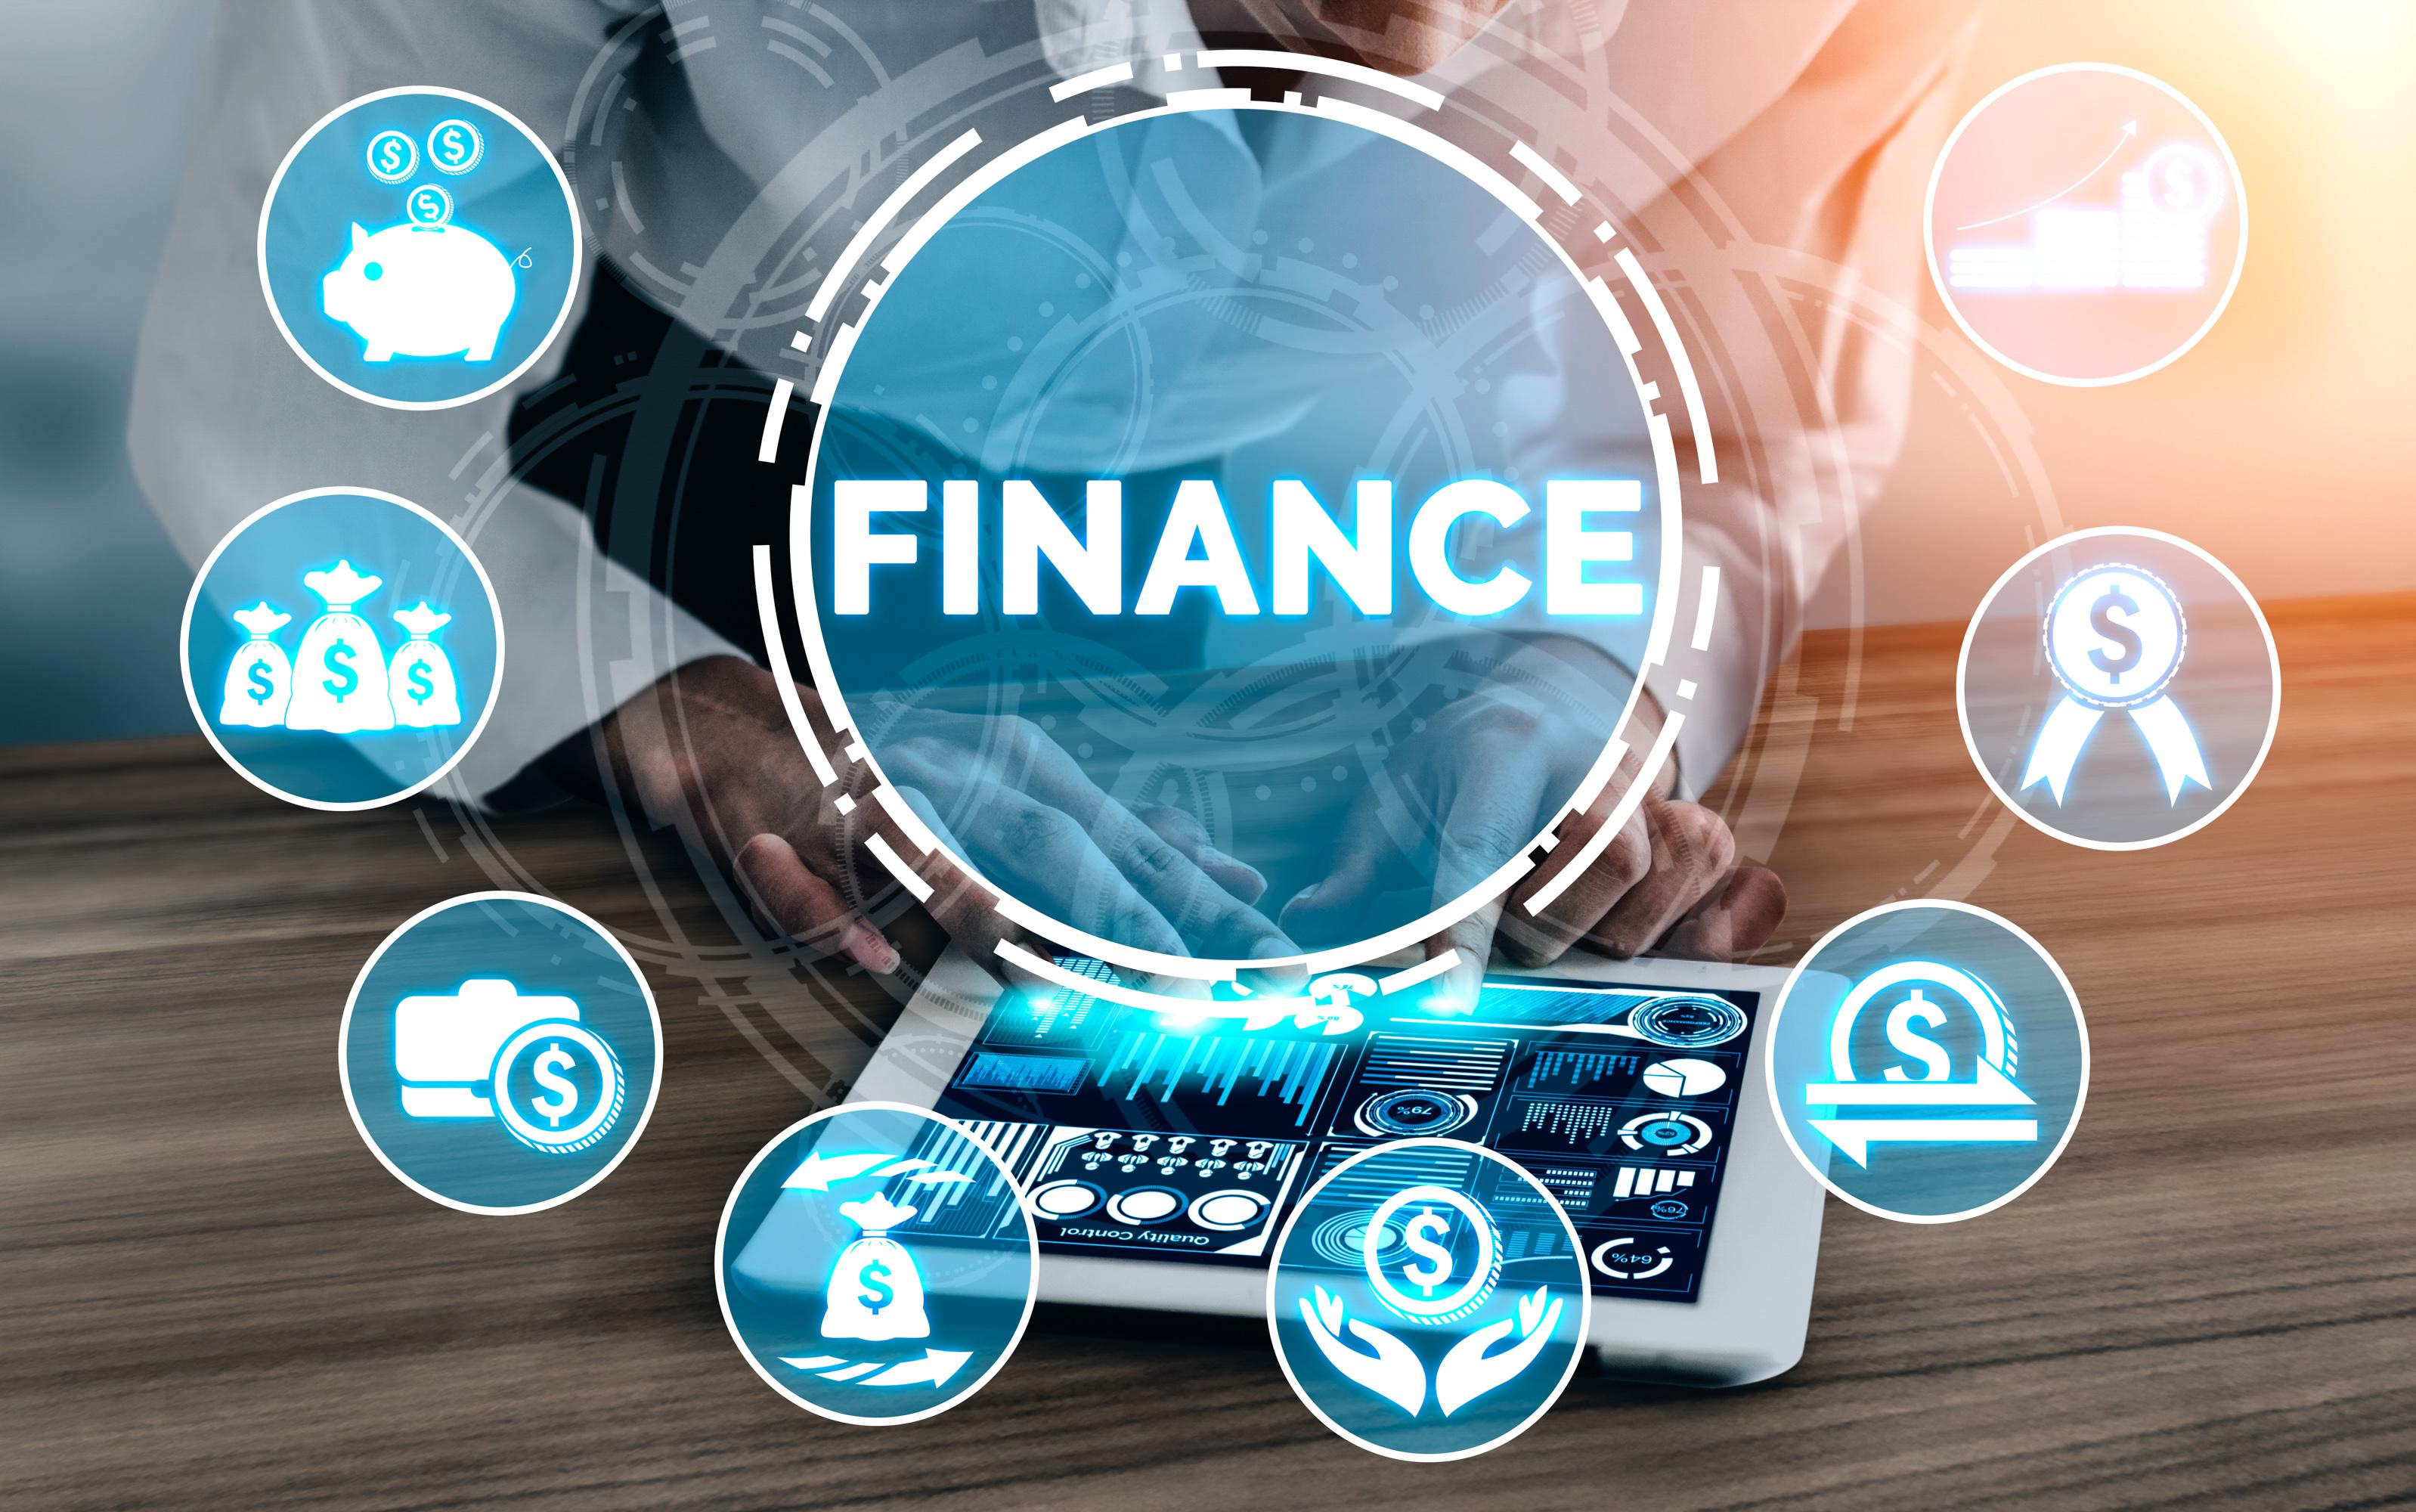 Neobanks revolutionize the Costa Rican financial system